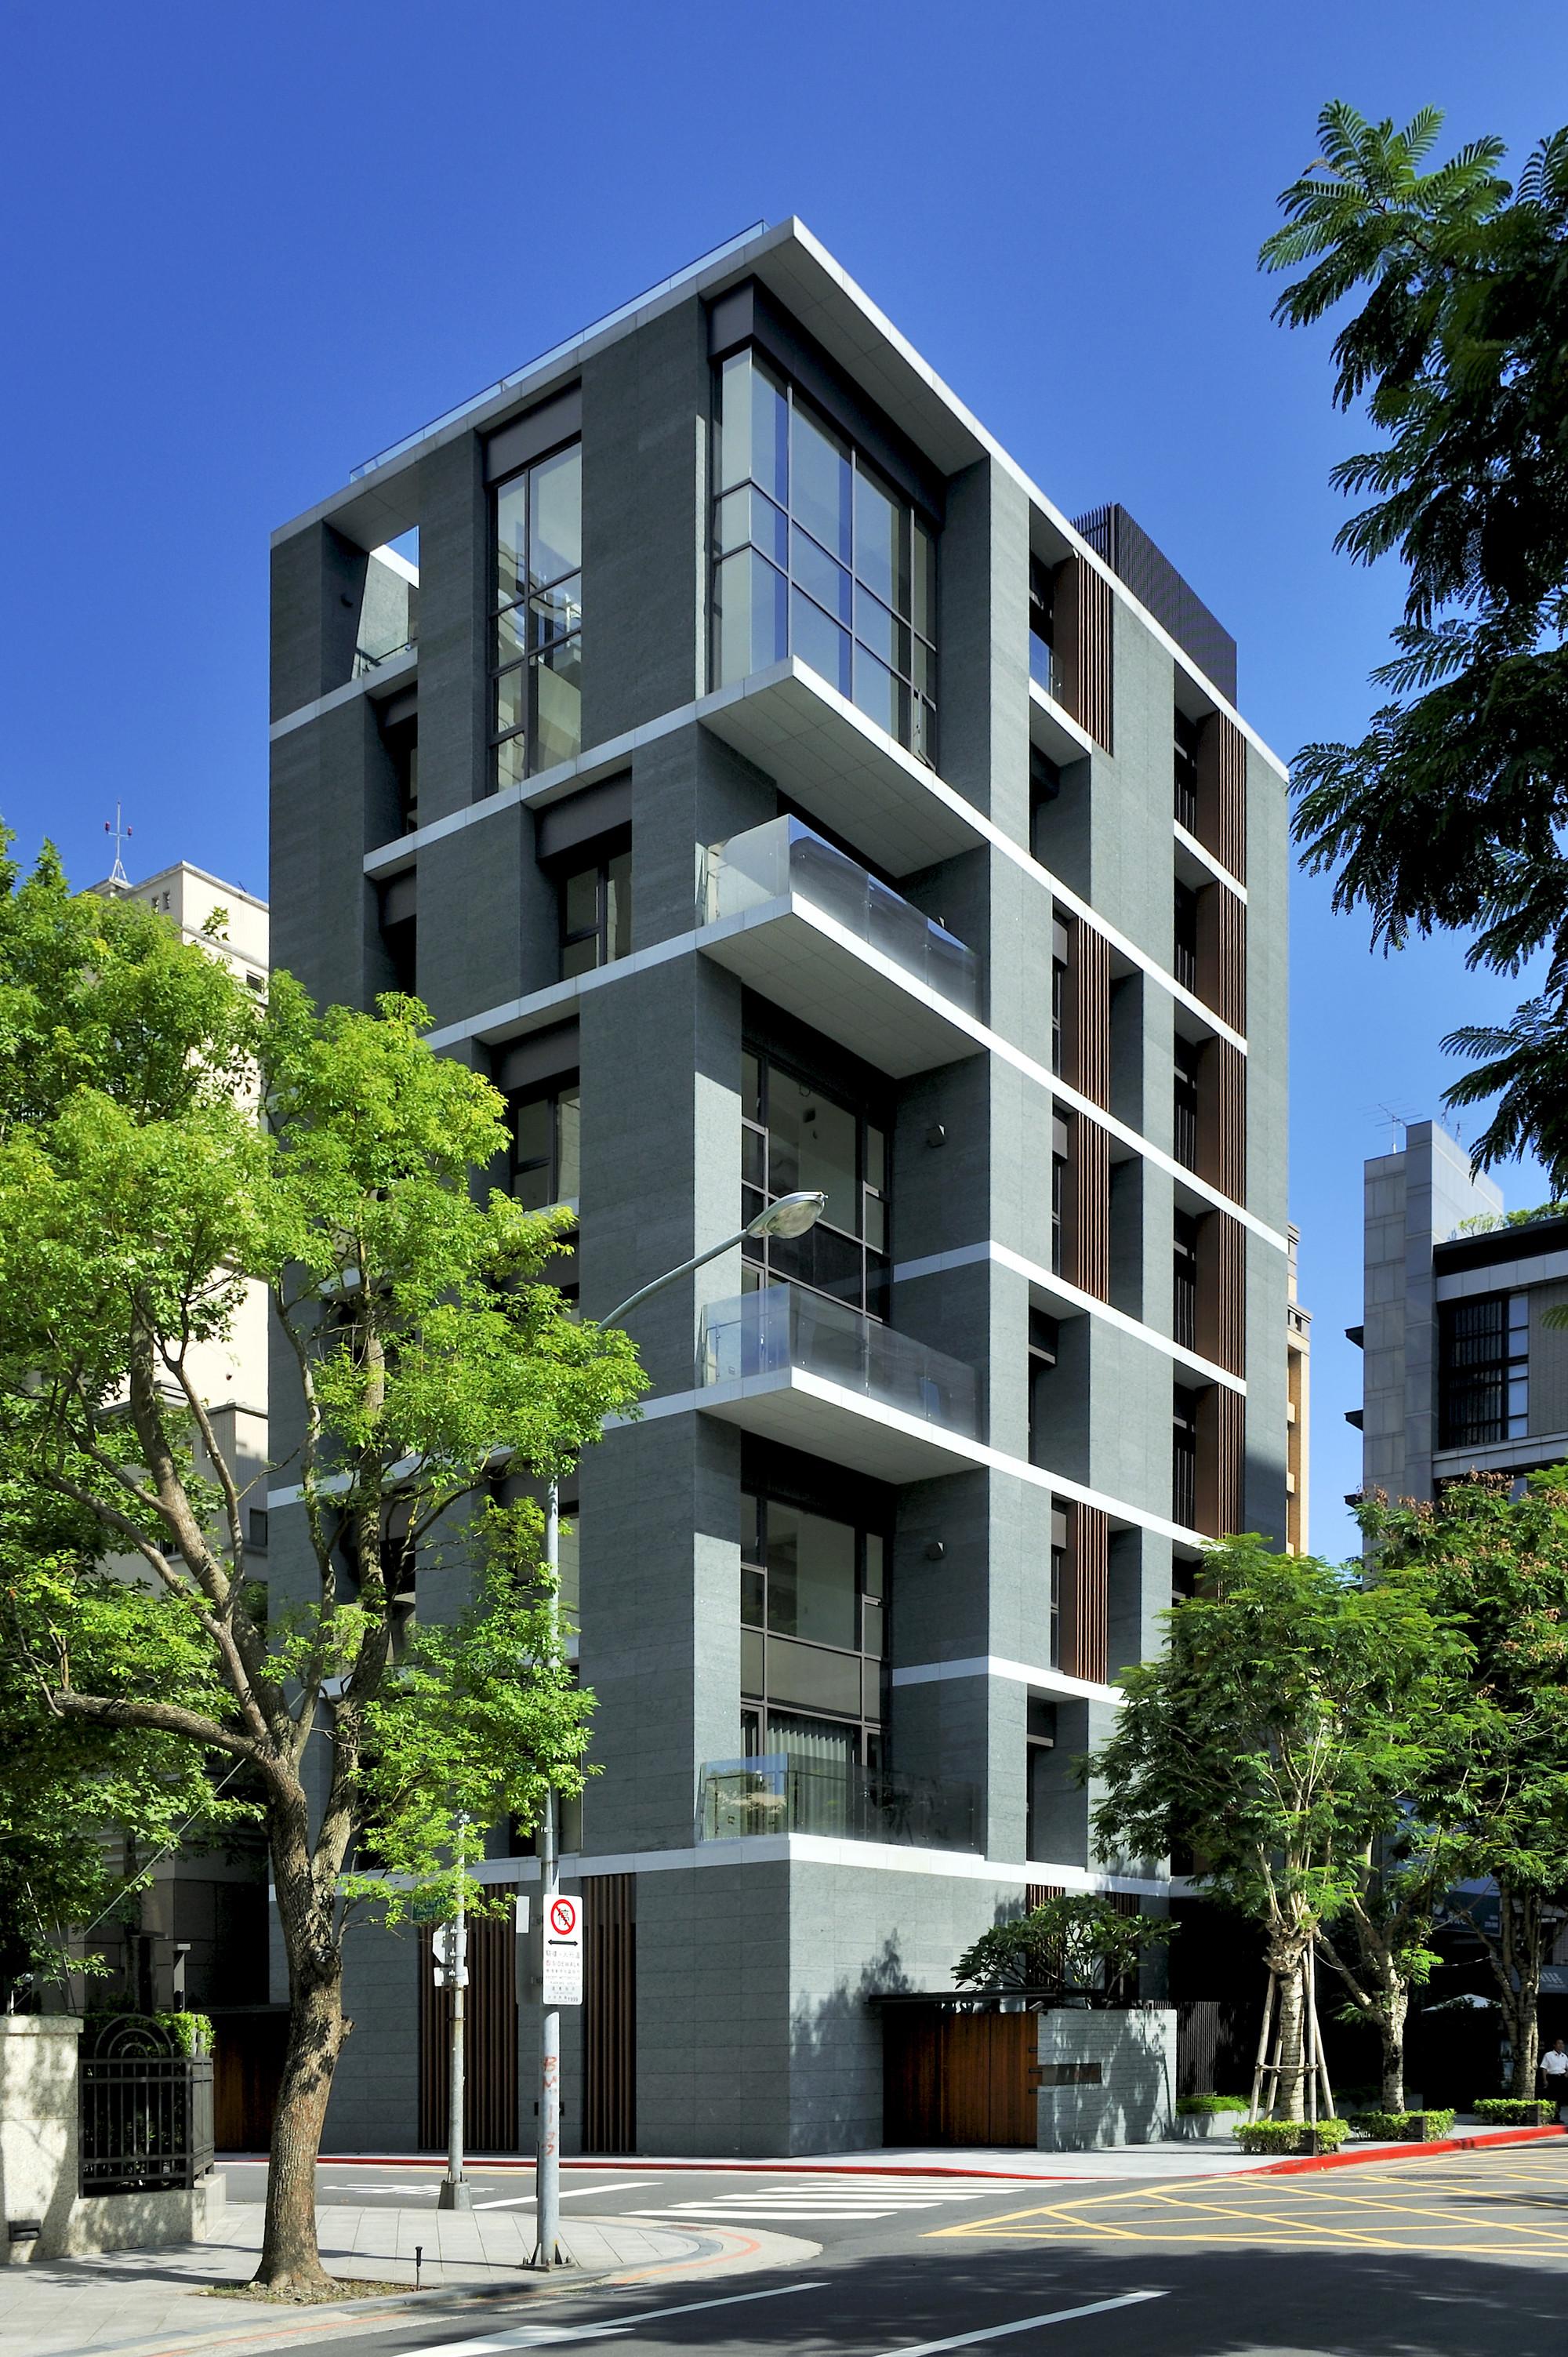 Hsu Housing Gallery Of U House Hsuyuan Kuo Architecture 5